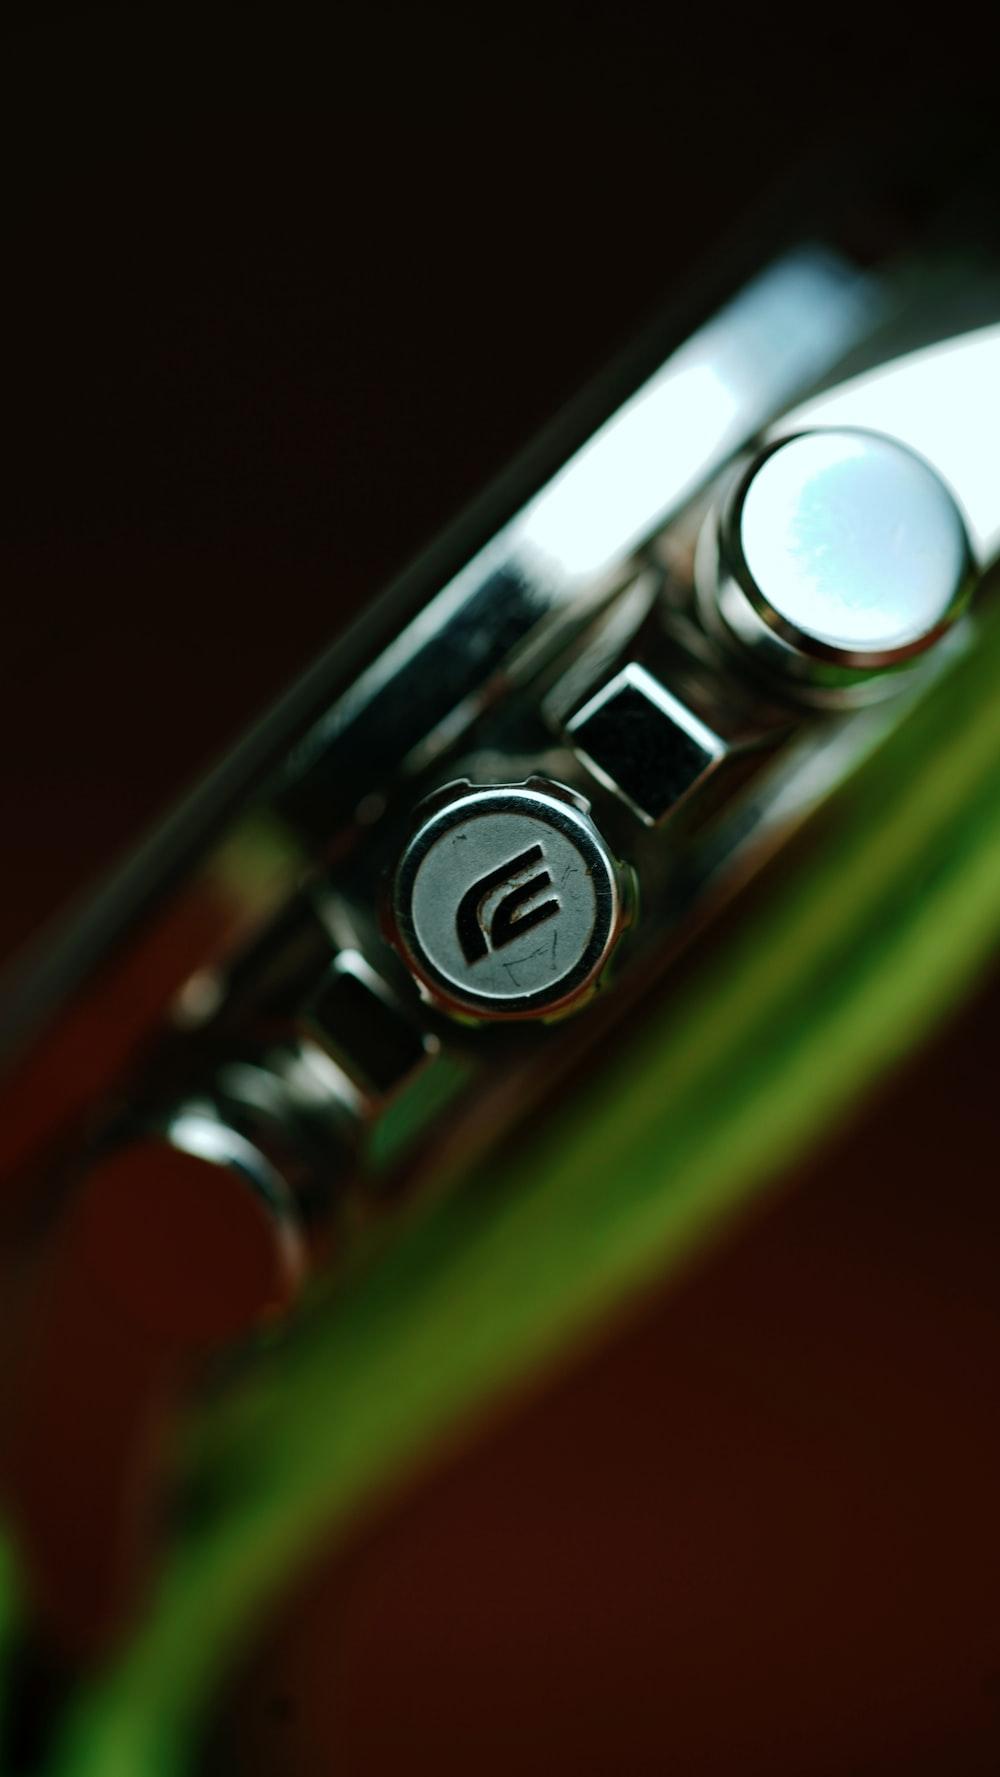 green and silver door lever